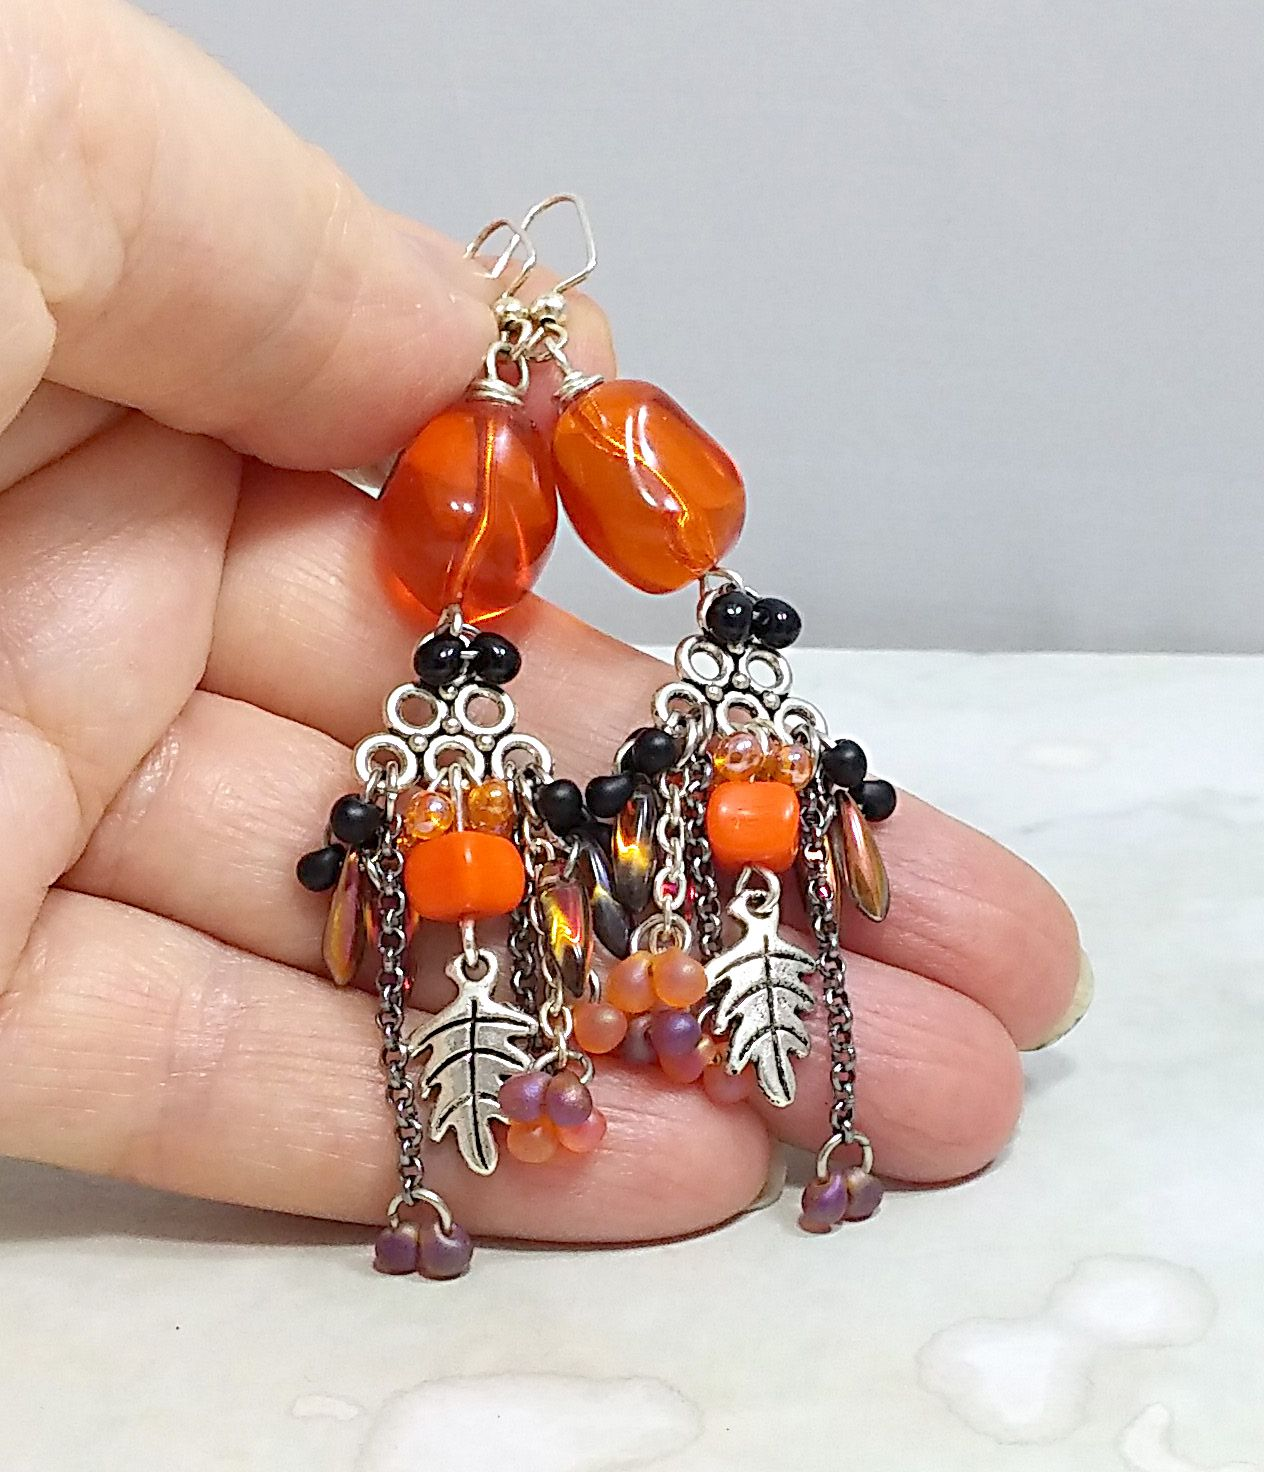 autumn beaded uniquejewelry harvest atumncolors orange earrings jewelry thanksgiving